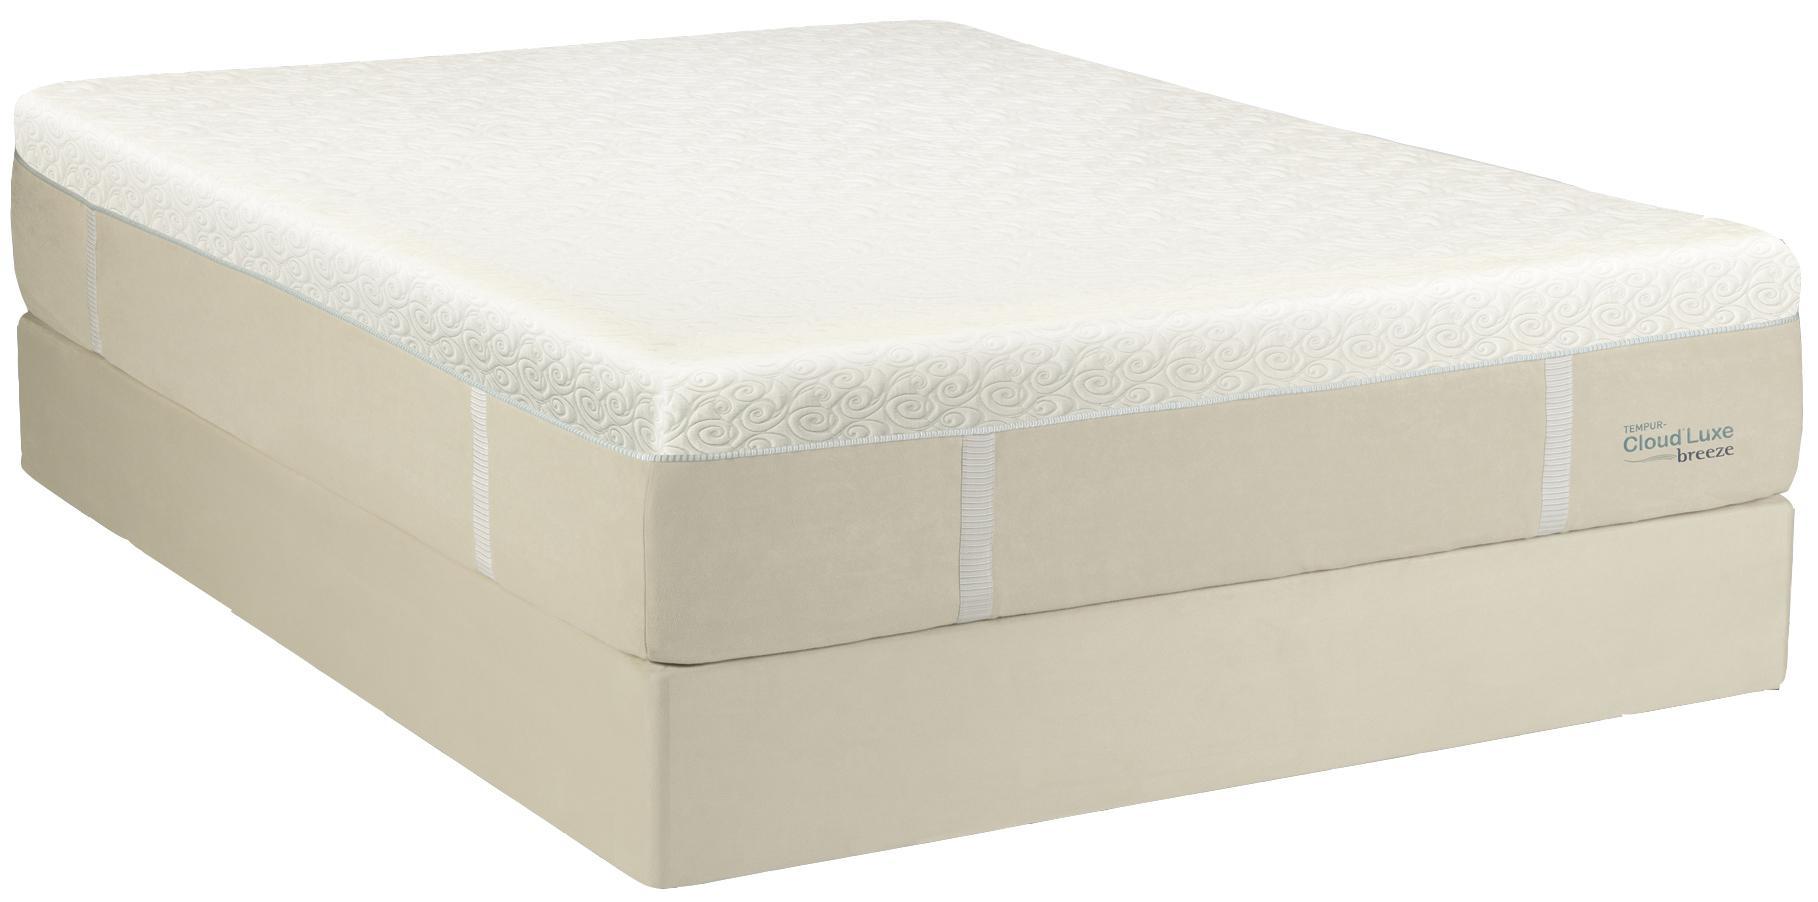 Tempur-Pedic® TEMPUR-Cloud® Luxe Breeze Cal King Ultra Soft Mattress Set - Item Number: 10109180+2x20520190